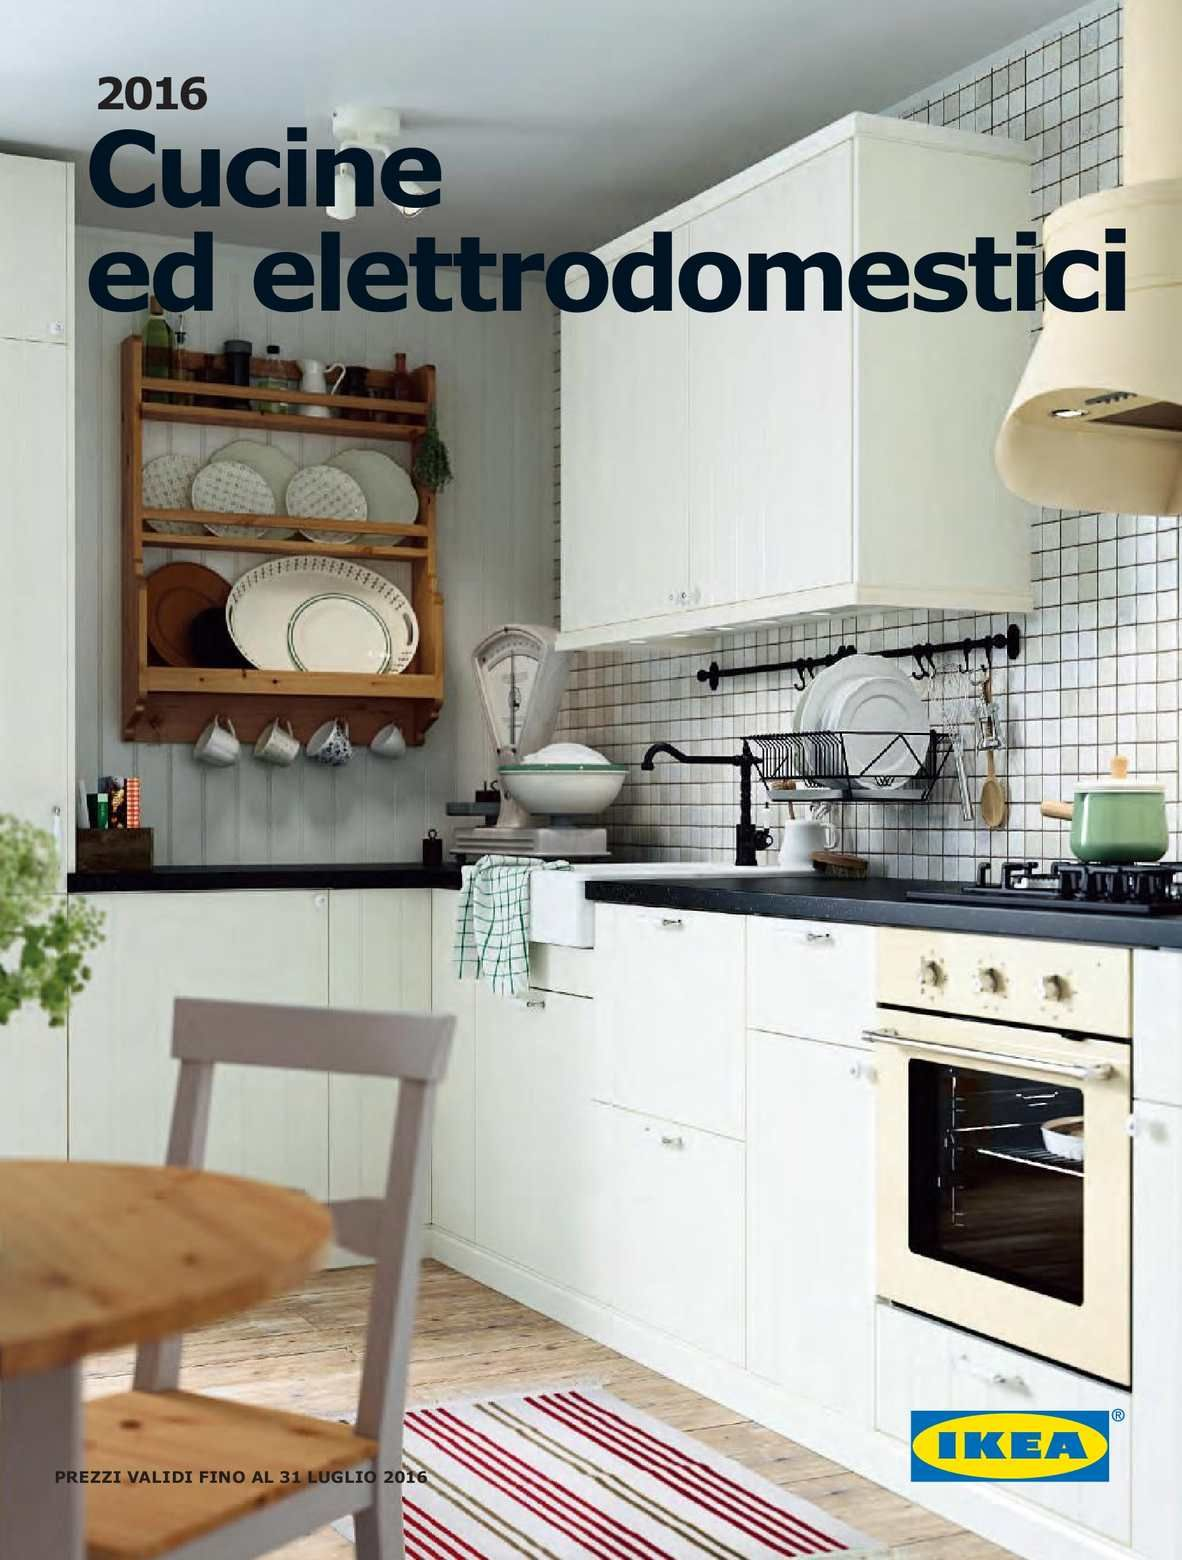 ikea fintorp idee cucina - Cerca con Google | Idee per la casa ...